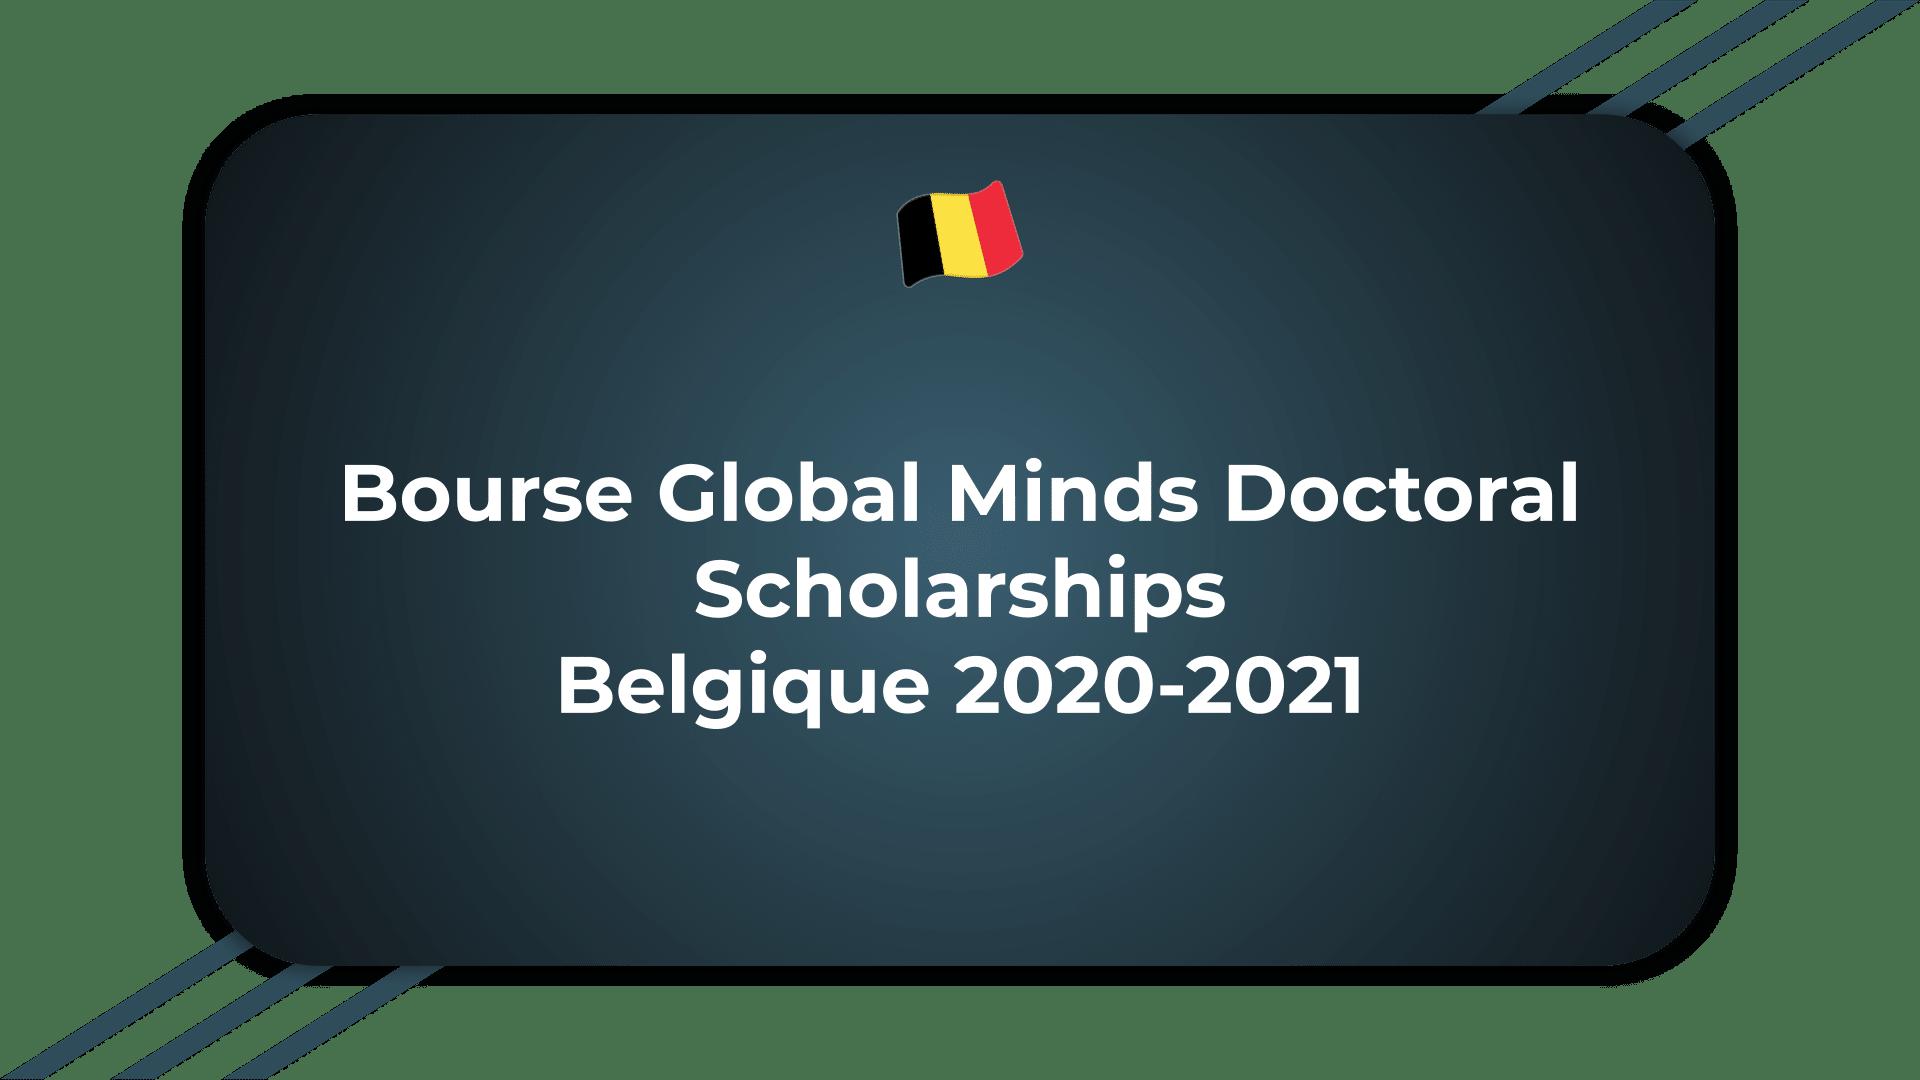 Bourse Global Minds Doctoral Scholarships